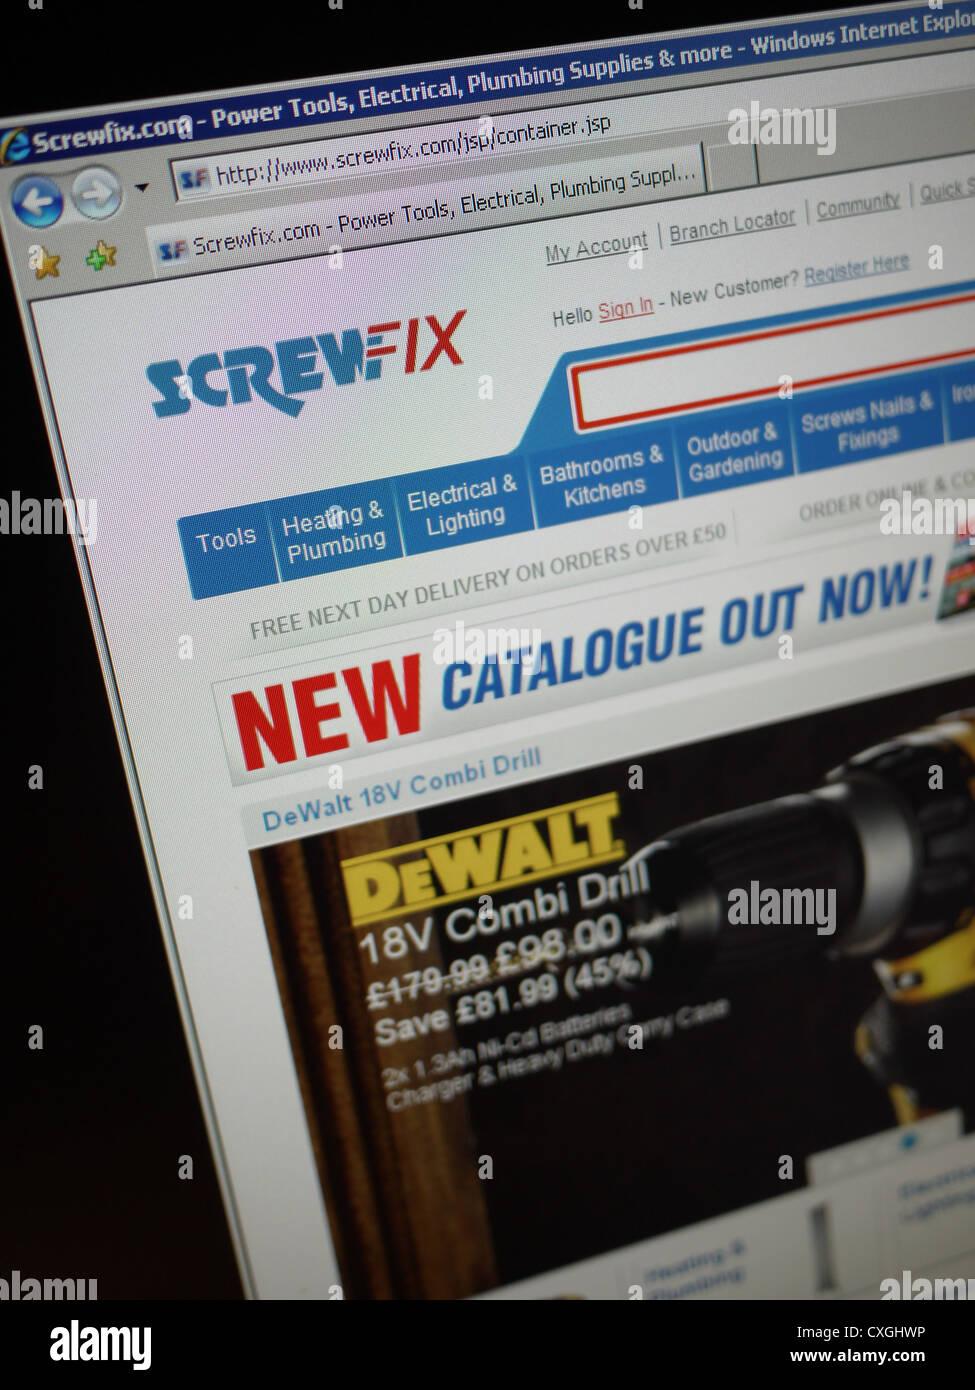 screwfix.com screwfix online hardware store Stock Photo, Royalty ...